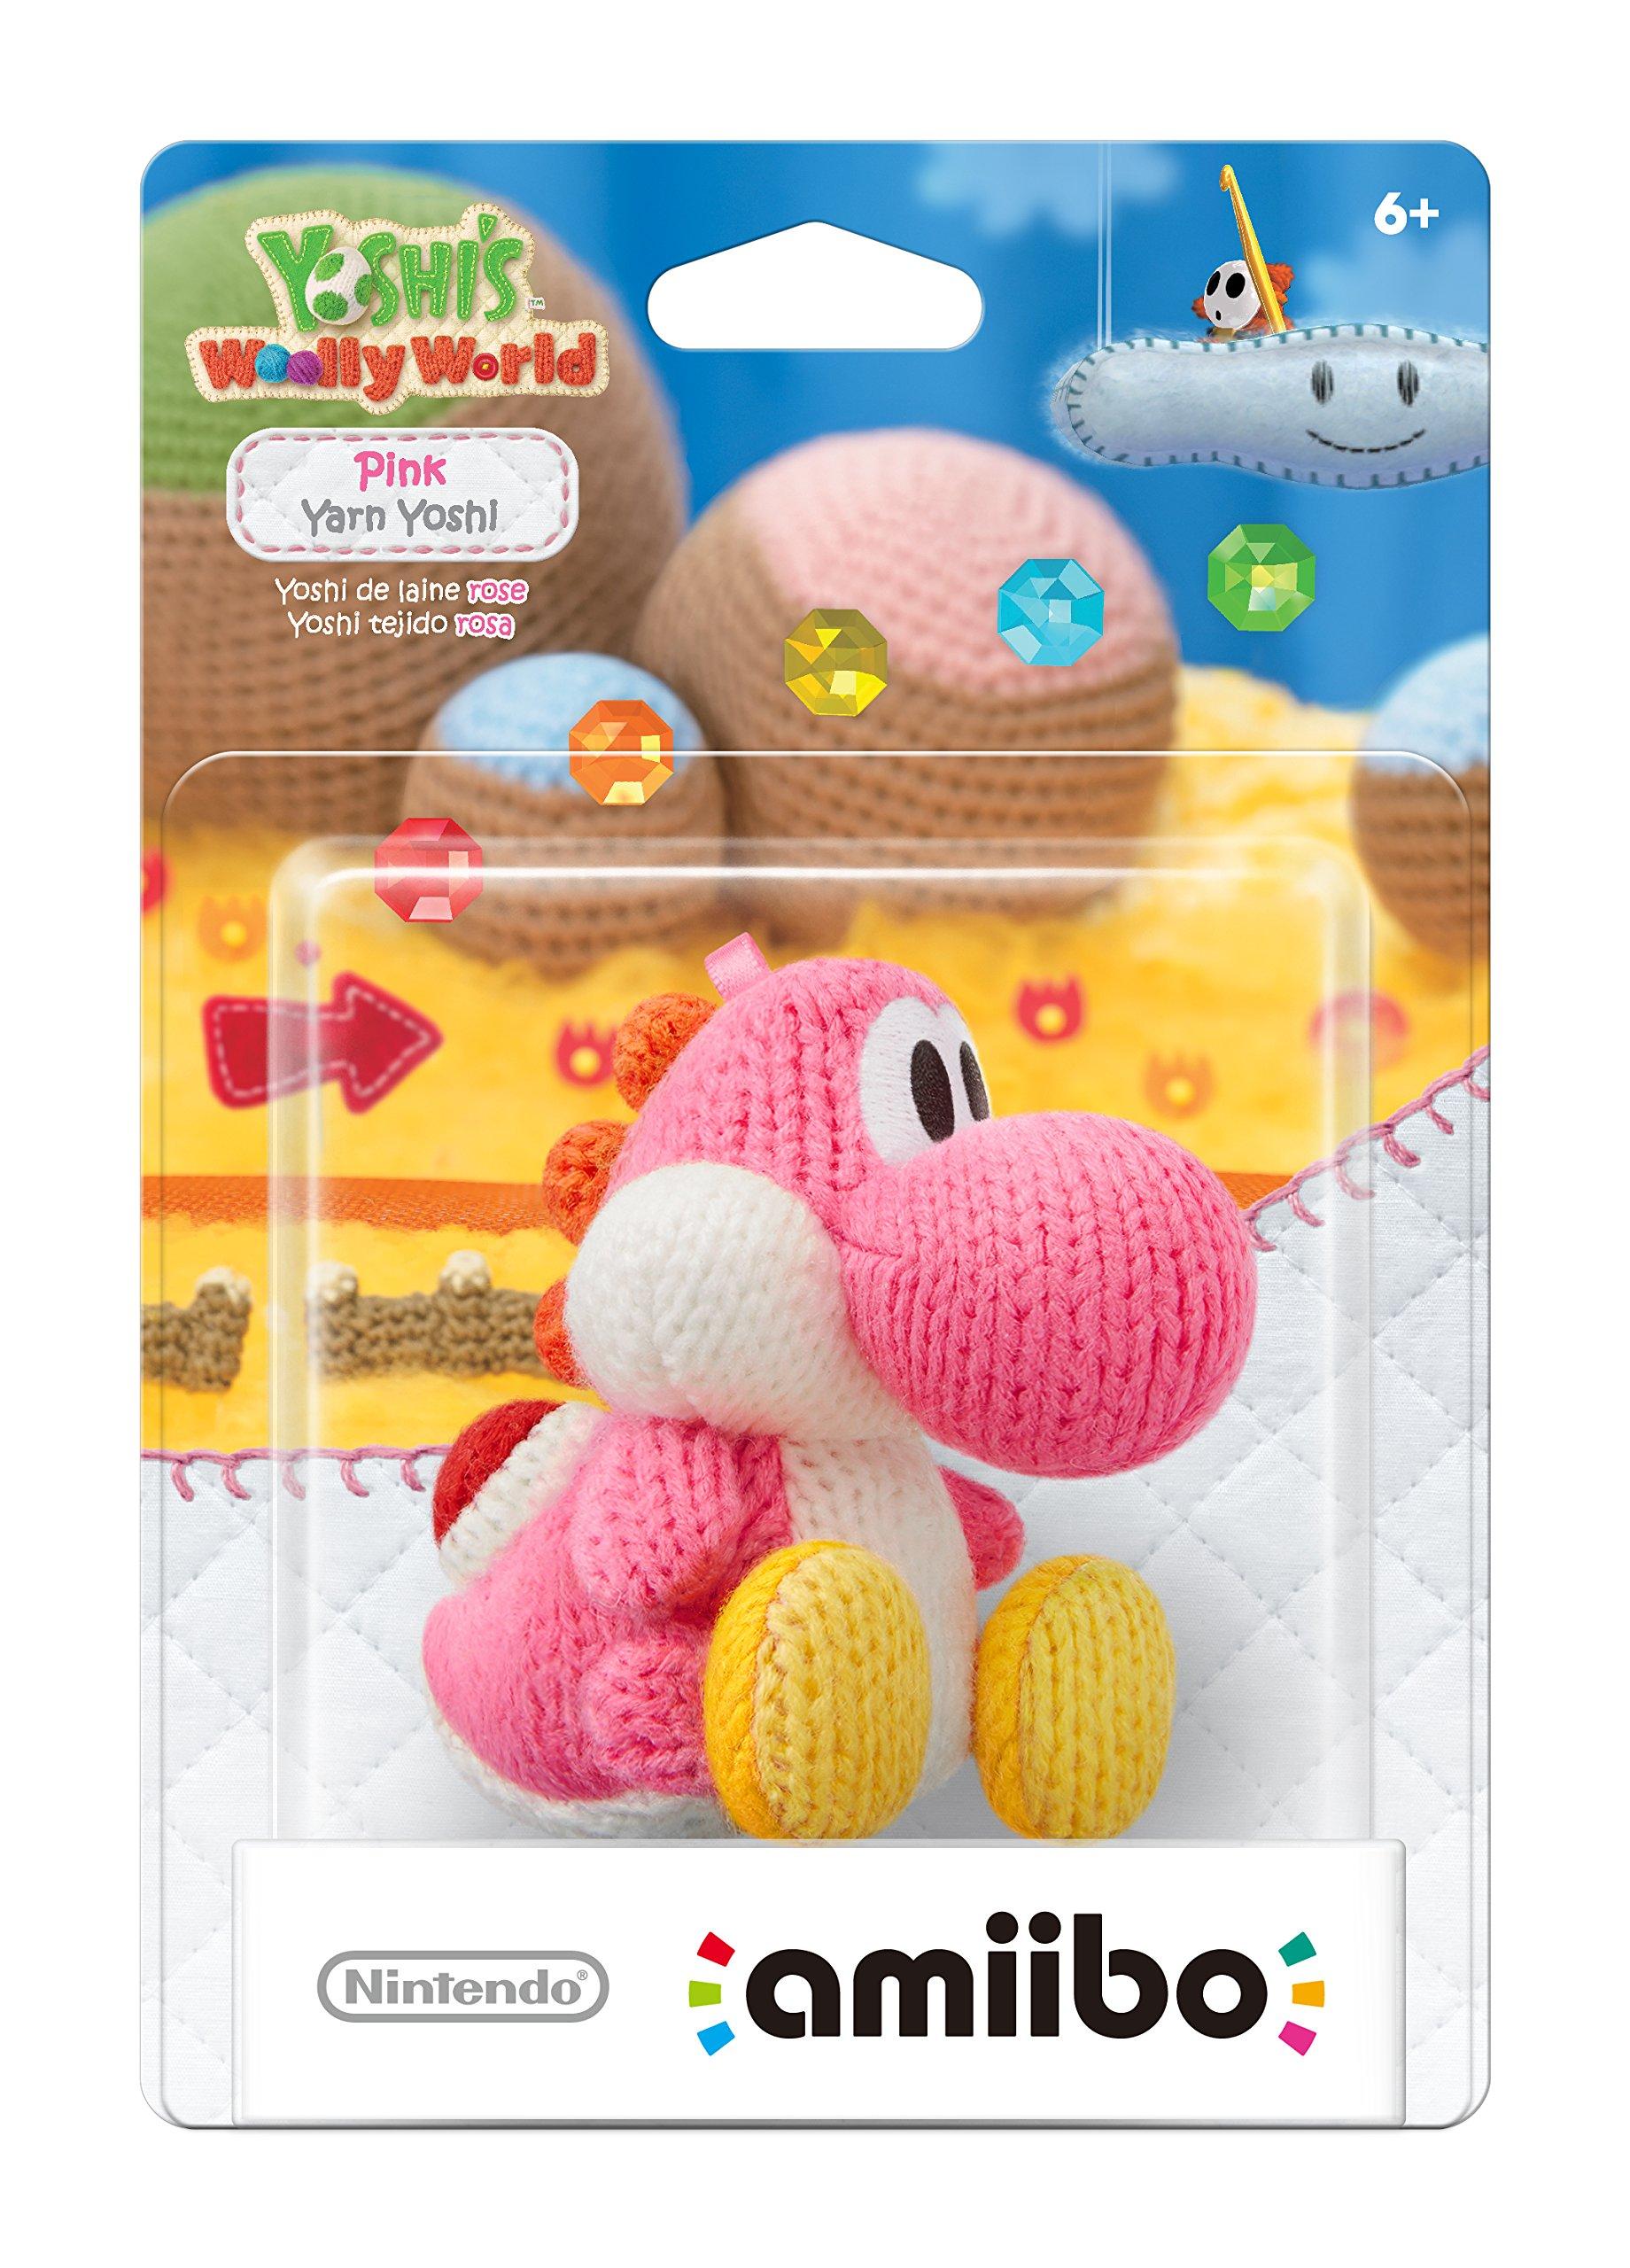 Pink Yarn Yoshi Amiibo (Yoshi's Woolly World Series) by Nintendo (Image #2)